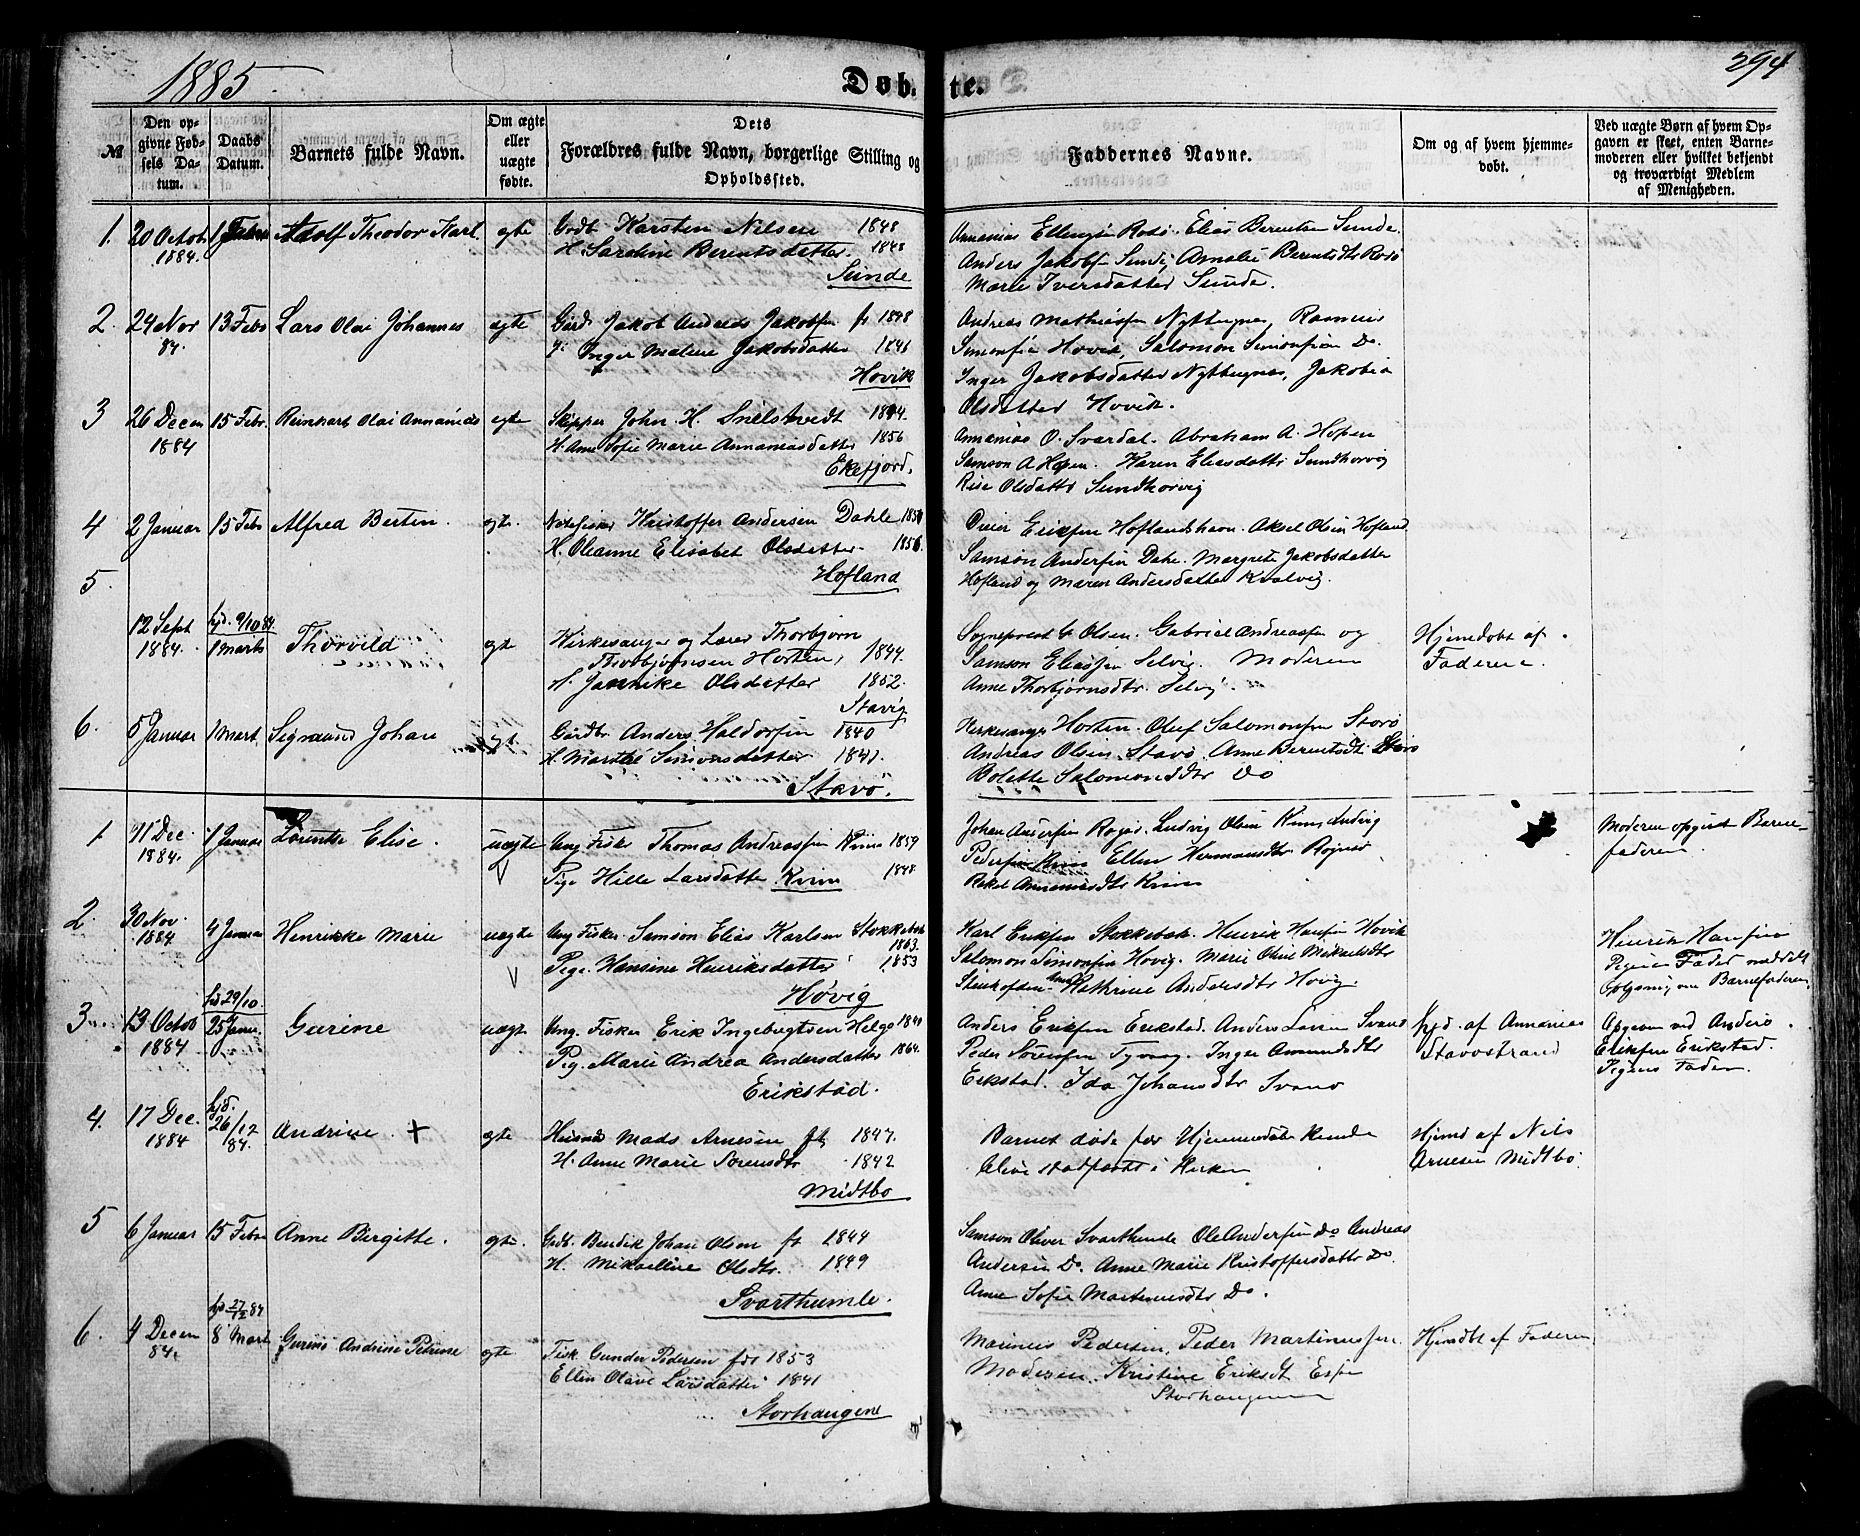 SAB, Kinn sokneprestembete, H/Haa/Haaa/L0006: Ministerialbok nr. A 6, 1857-1885, s. 294